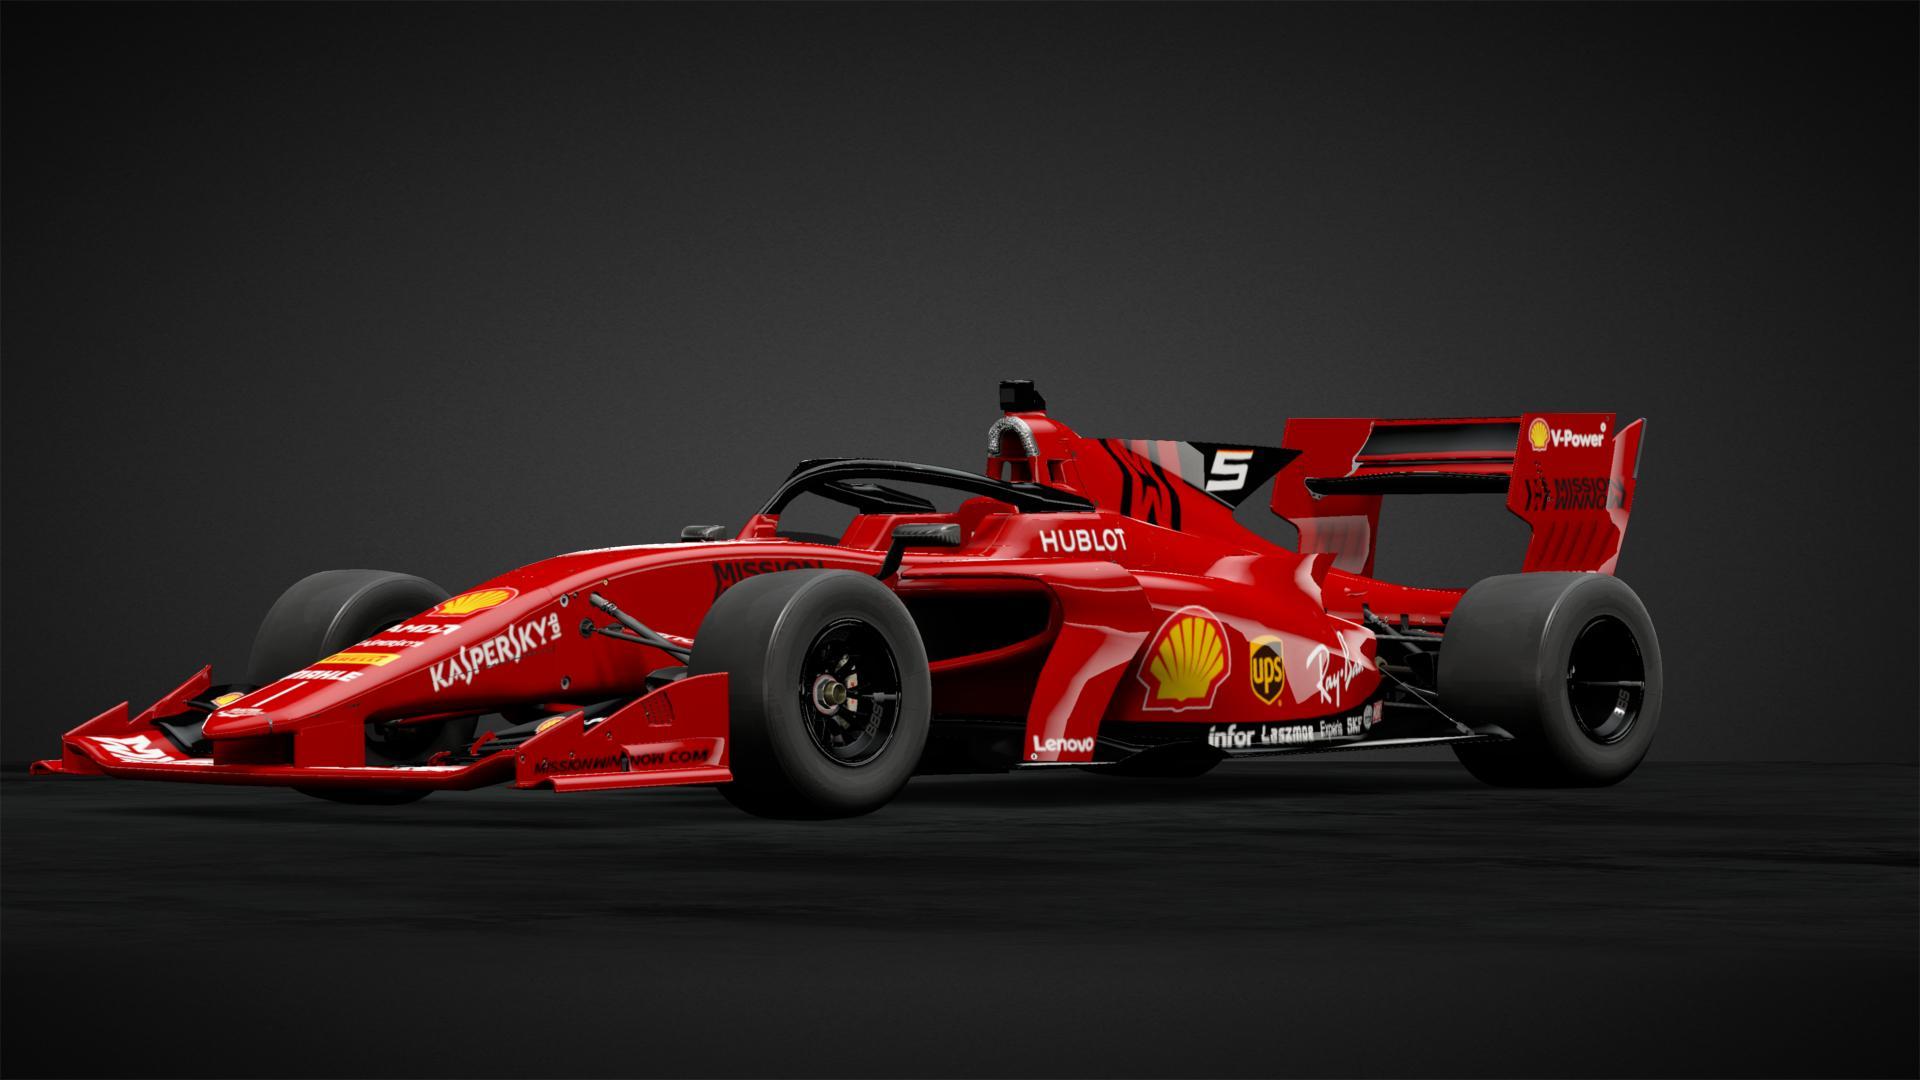 Ferrari F1 2020 Concept Livery - Cars Trend Today